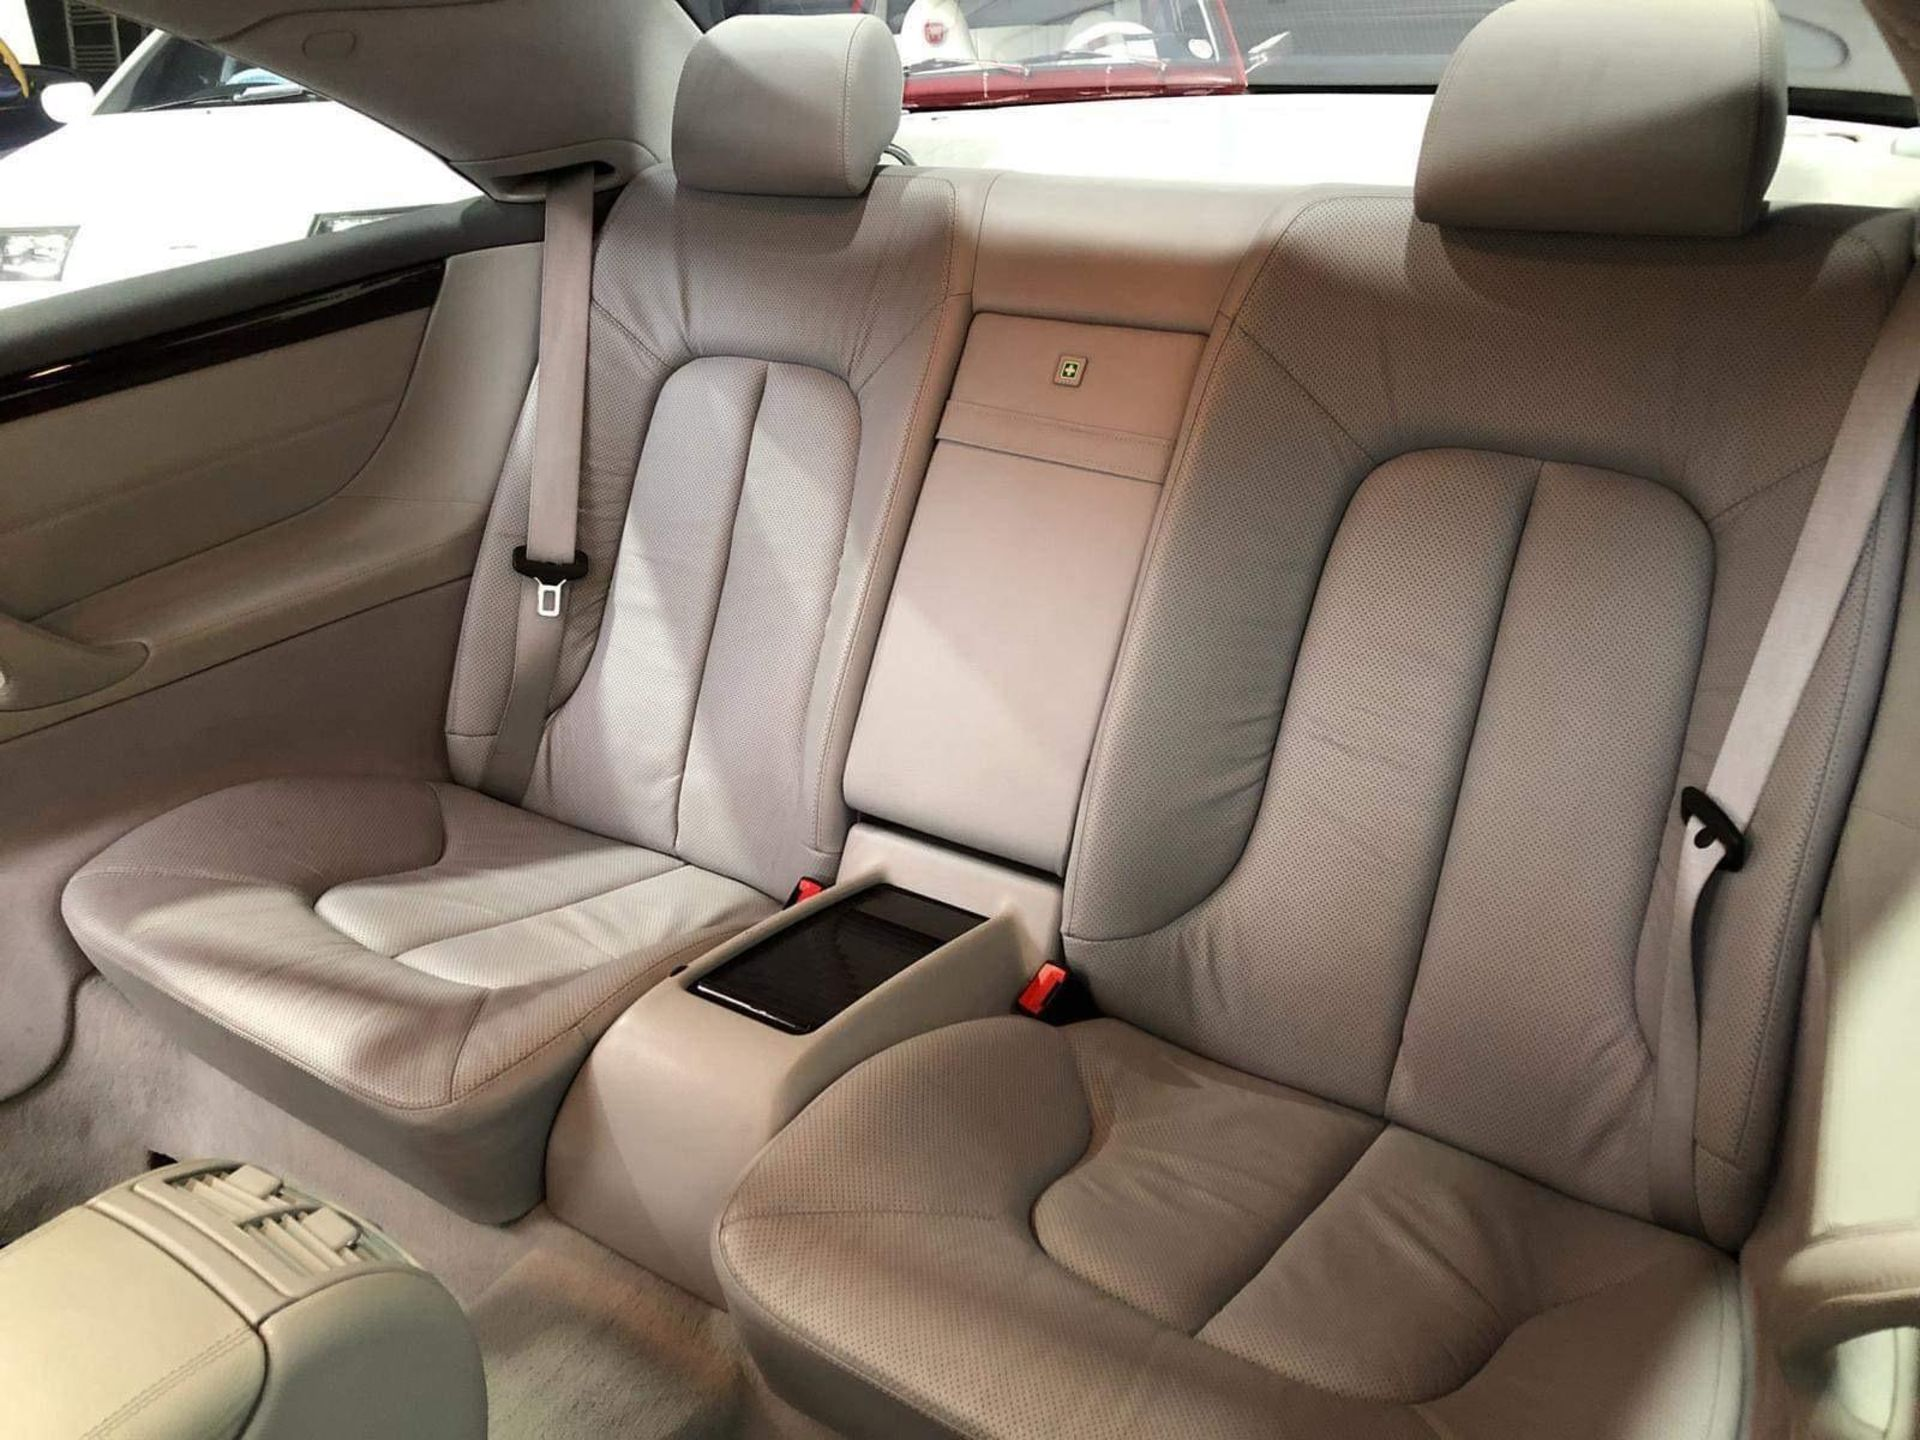 2001 Mercedes-Benz CL500 CLASS, SPORT, SOUTHERN REG, TOP SPEC, NO VAT - Image 7 of 10